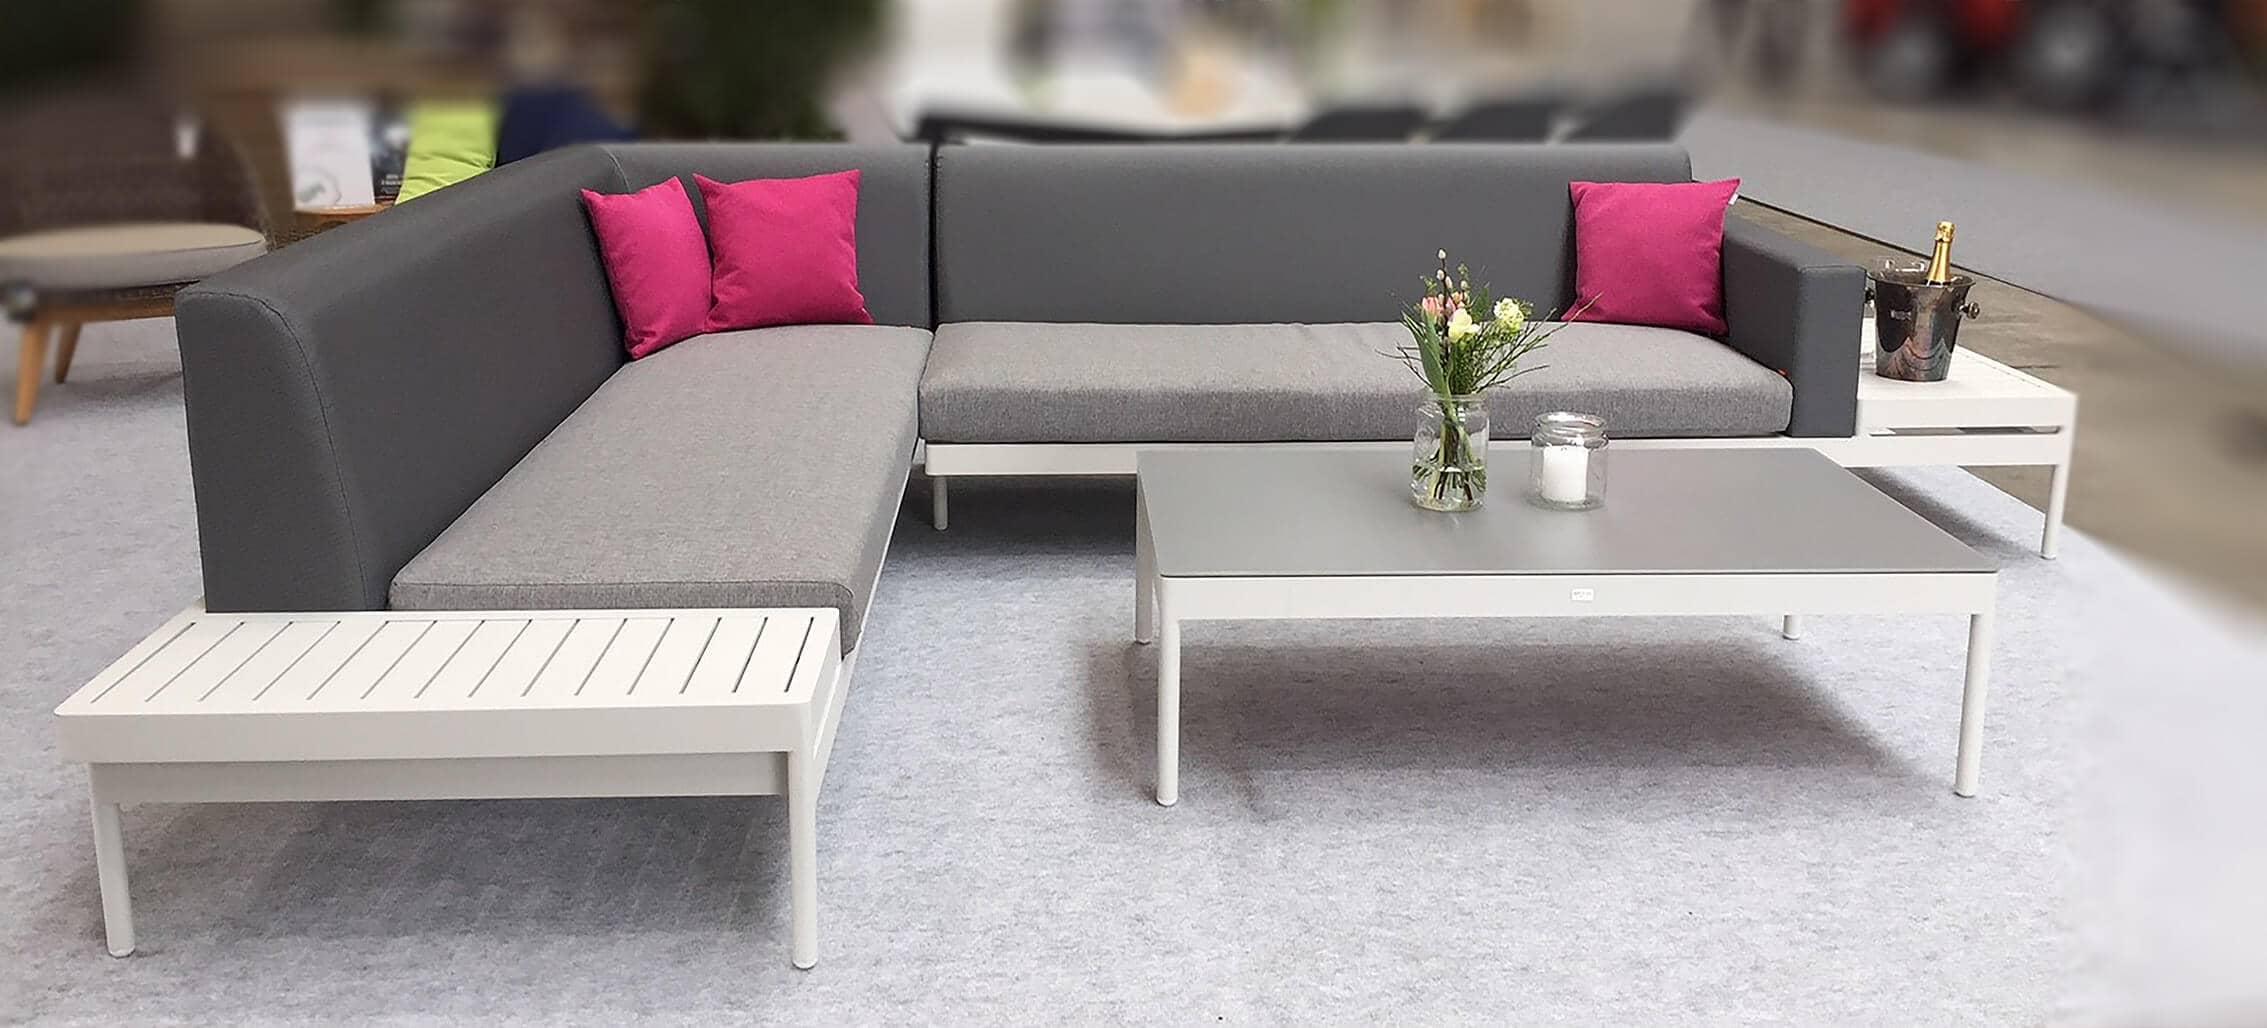 vorschau aluminium lounge leana 6 personen. Black Bedroom Furniture Sets. Home Design Ideas